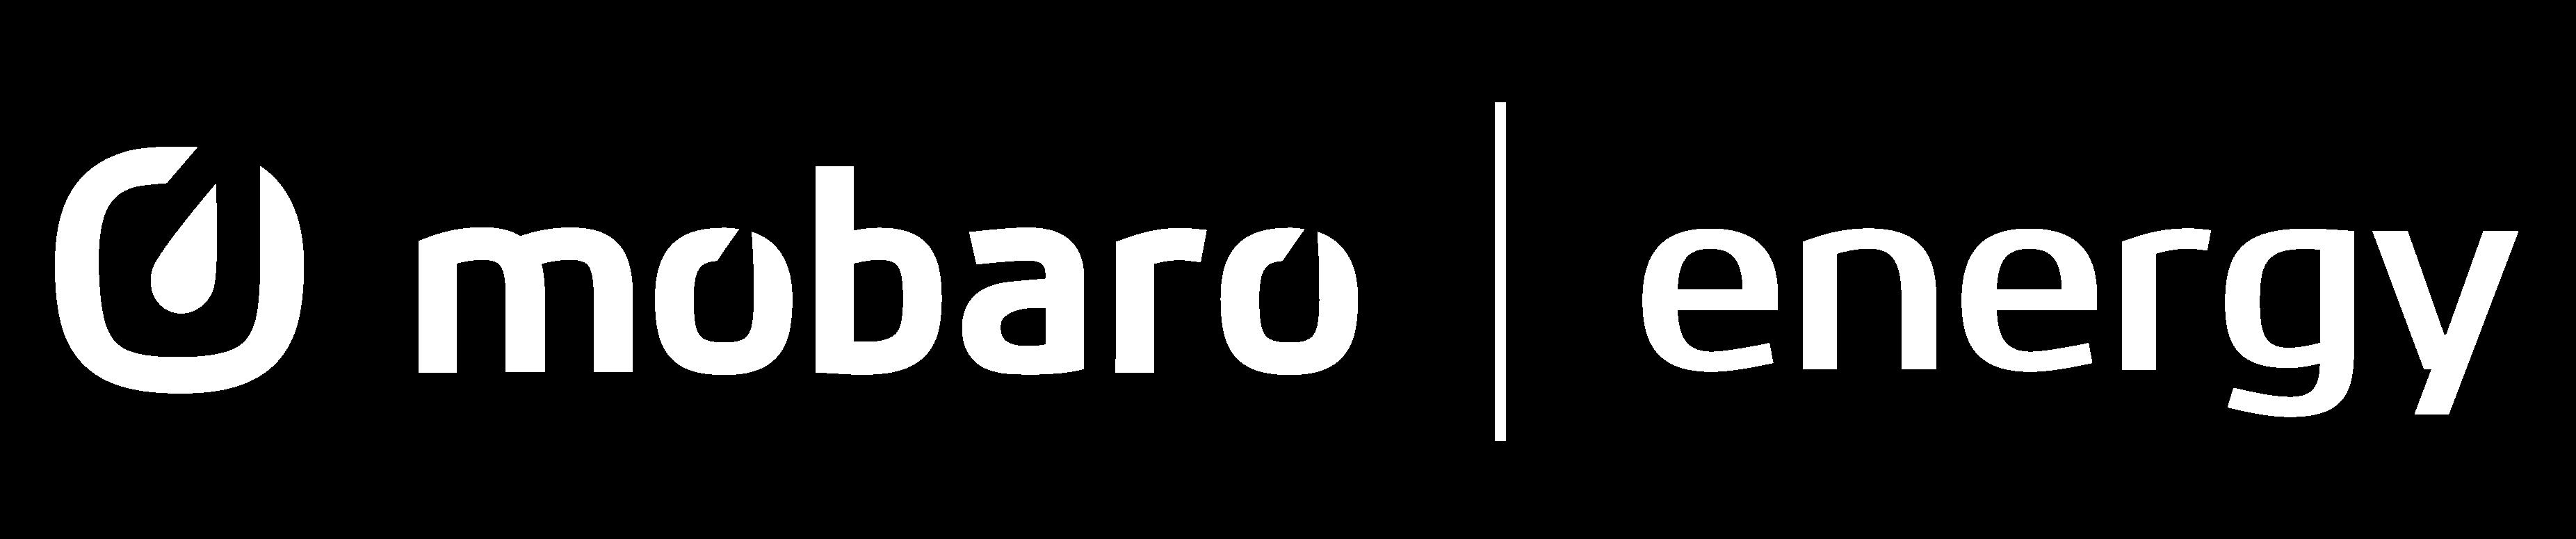 Mobaro-energy_Logo_RGB-white.png